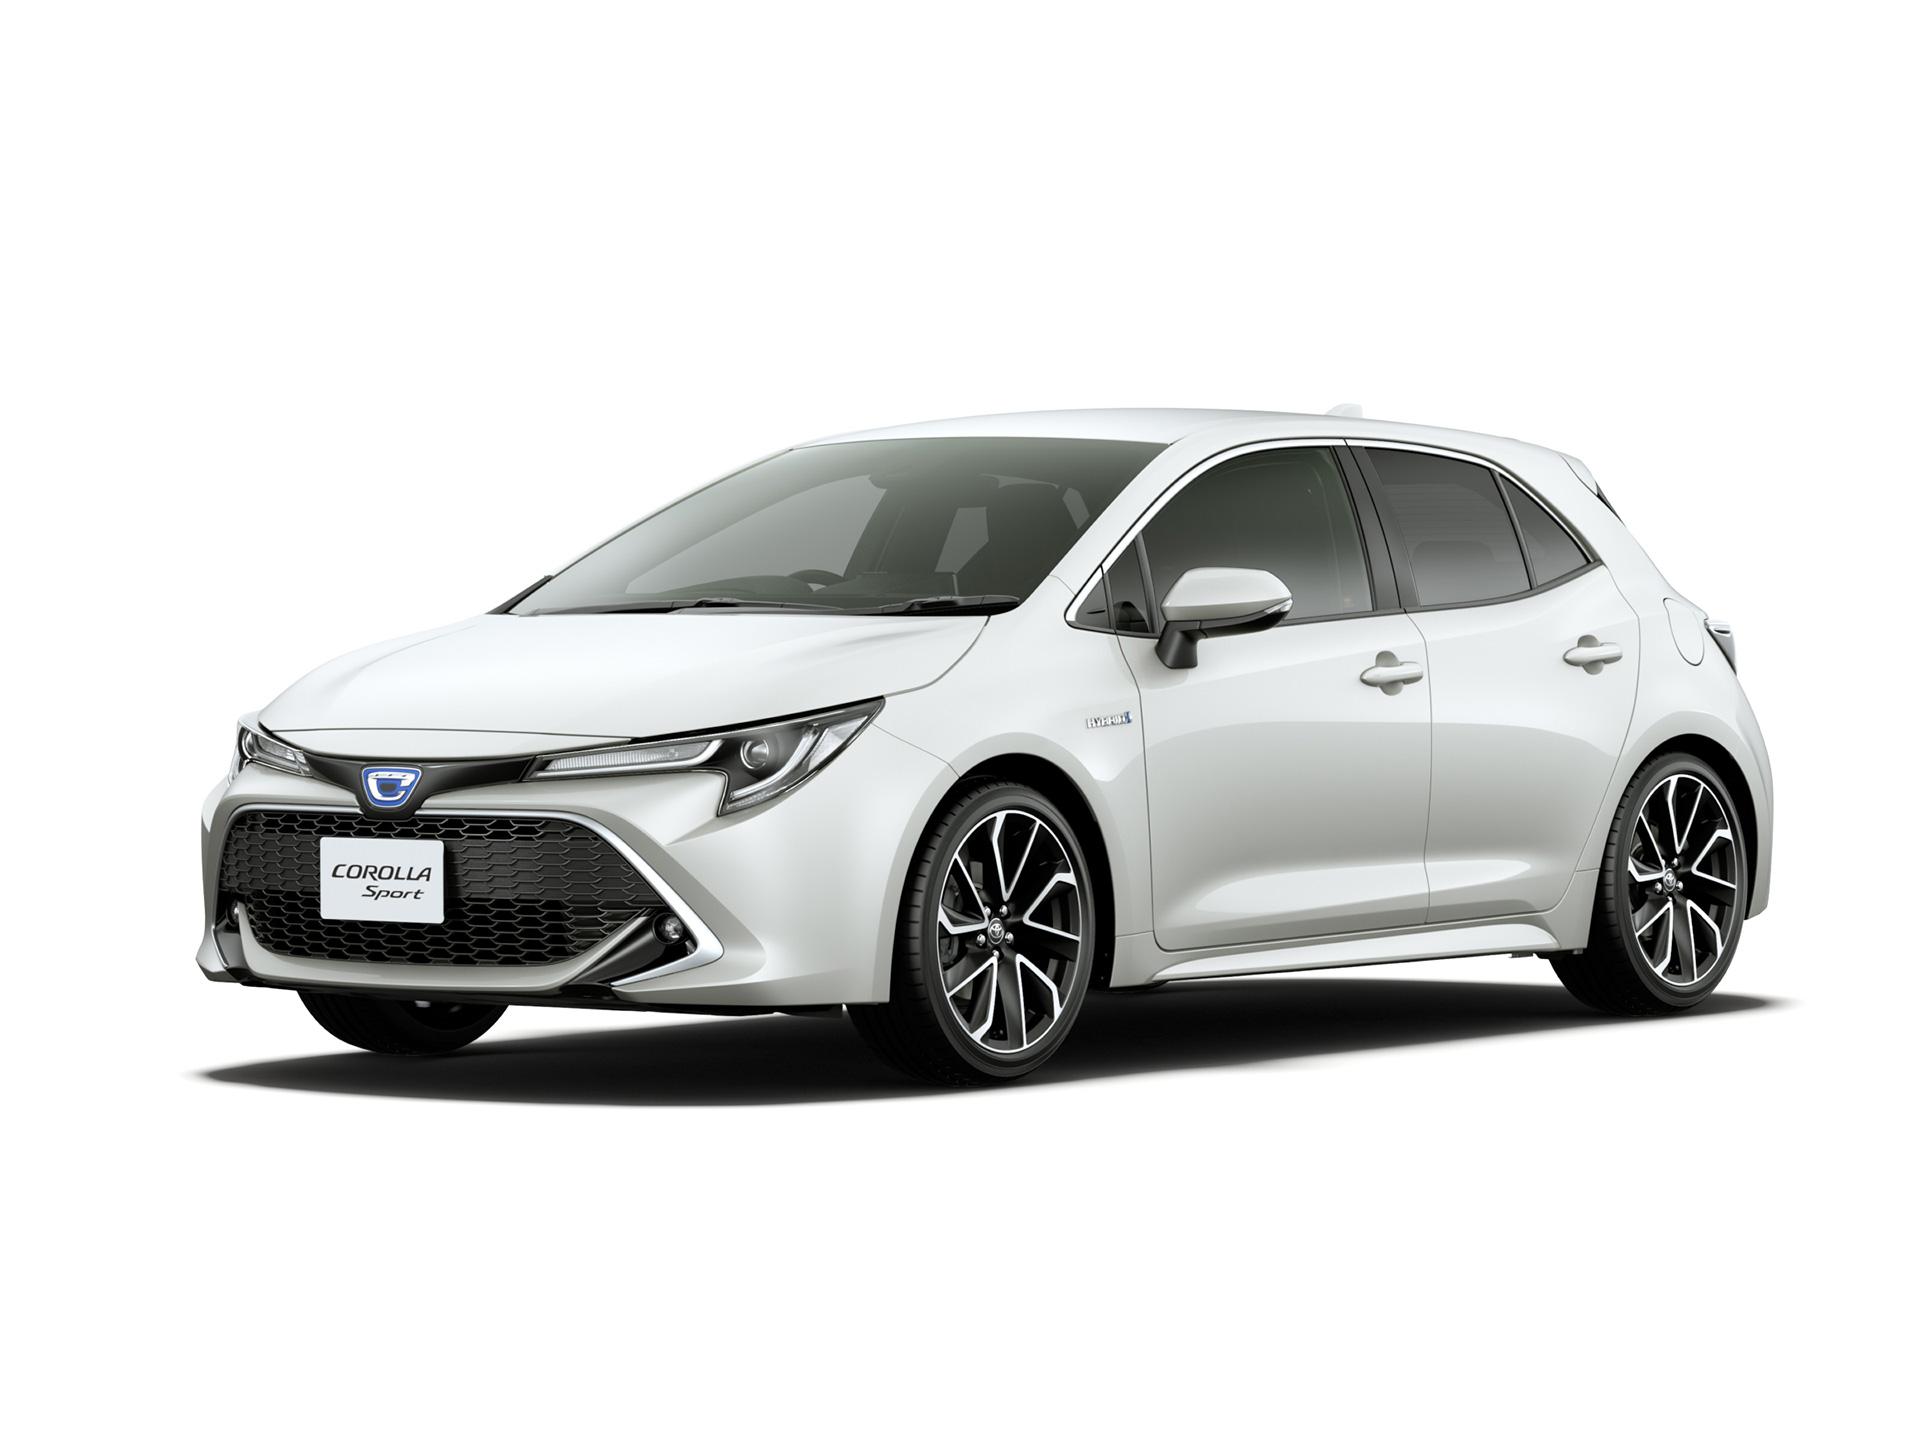 Toyota Rolls Out New Corolla Sport Toyota Toyota Global Newsroom